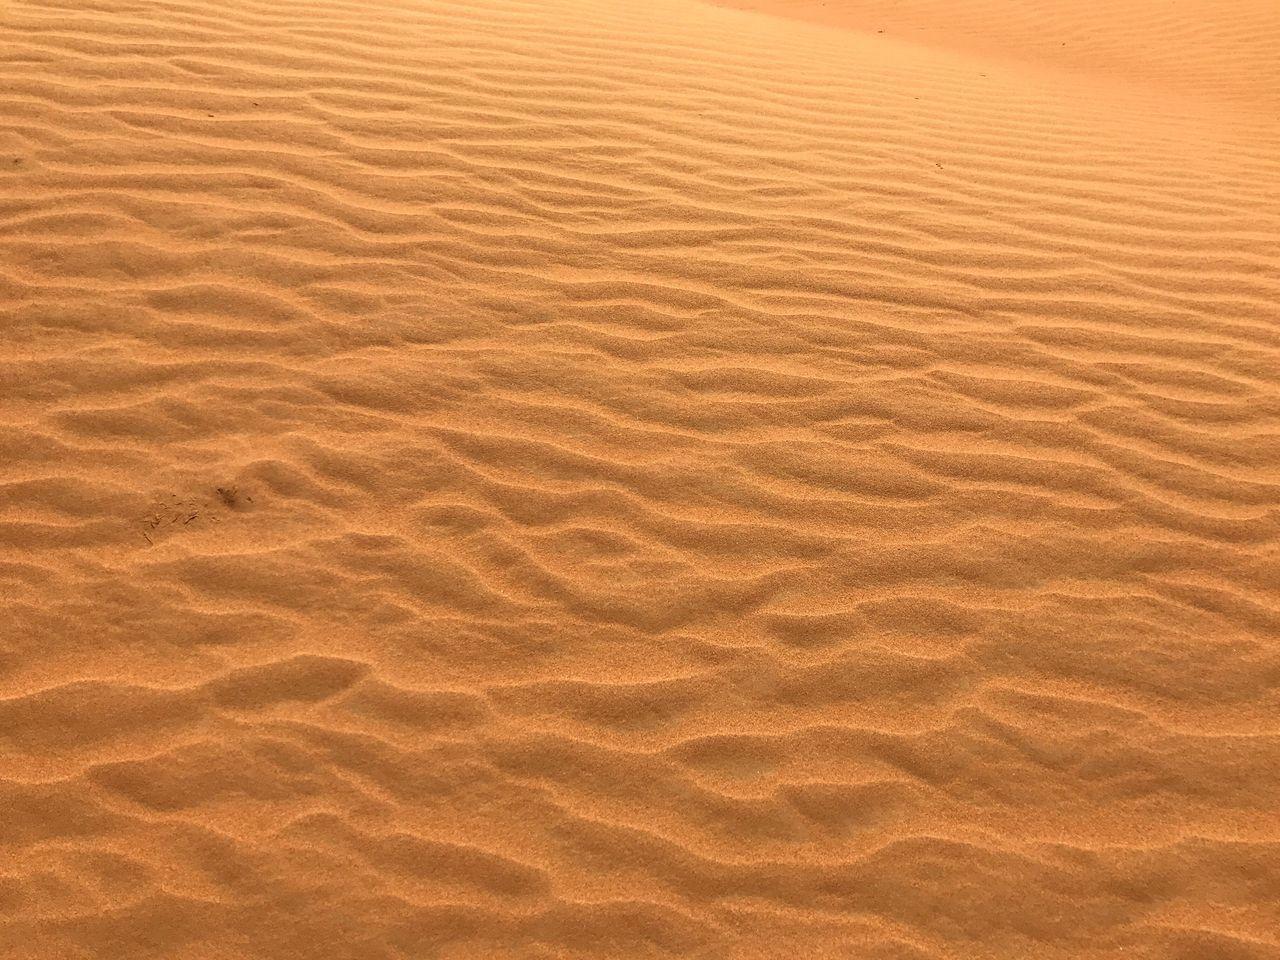 Sand Sand Dune Backgrounds Nature Desert Tranquility Wave Pattern Beauty In Nature UAE UAE , Dubai Uae #dubai #sharjah #ajman #rak #fujairah #alain #abudhabi #ummalquwain #instagood #instamood #instalike #mydubai #myuae #dubaigems #emirates #dxb #myabudhabi #shj #insharjah #qatar Oman Bahrain Kuwait Ksa [ Dessert Desert Scenics Rippled Arid Climate Brown Environment No People Tranquil Scene Full Frame Outdoors Landscape Beach Track - Imprint